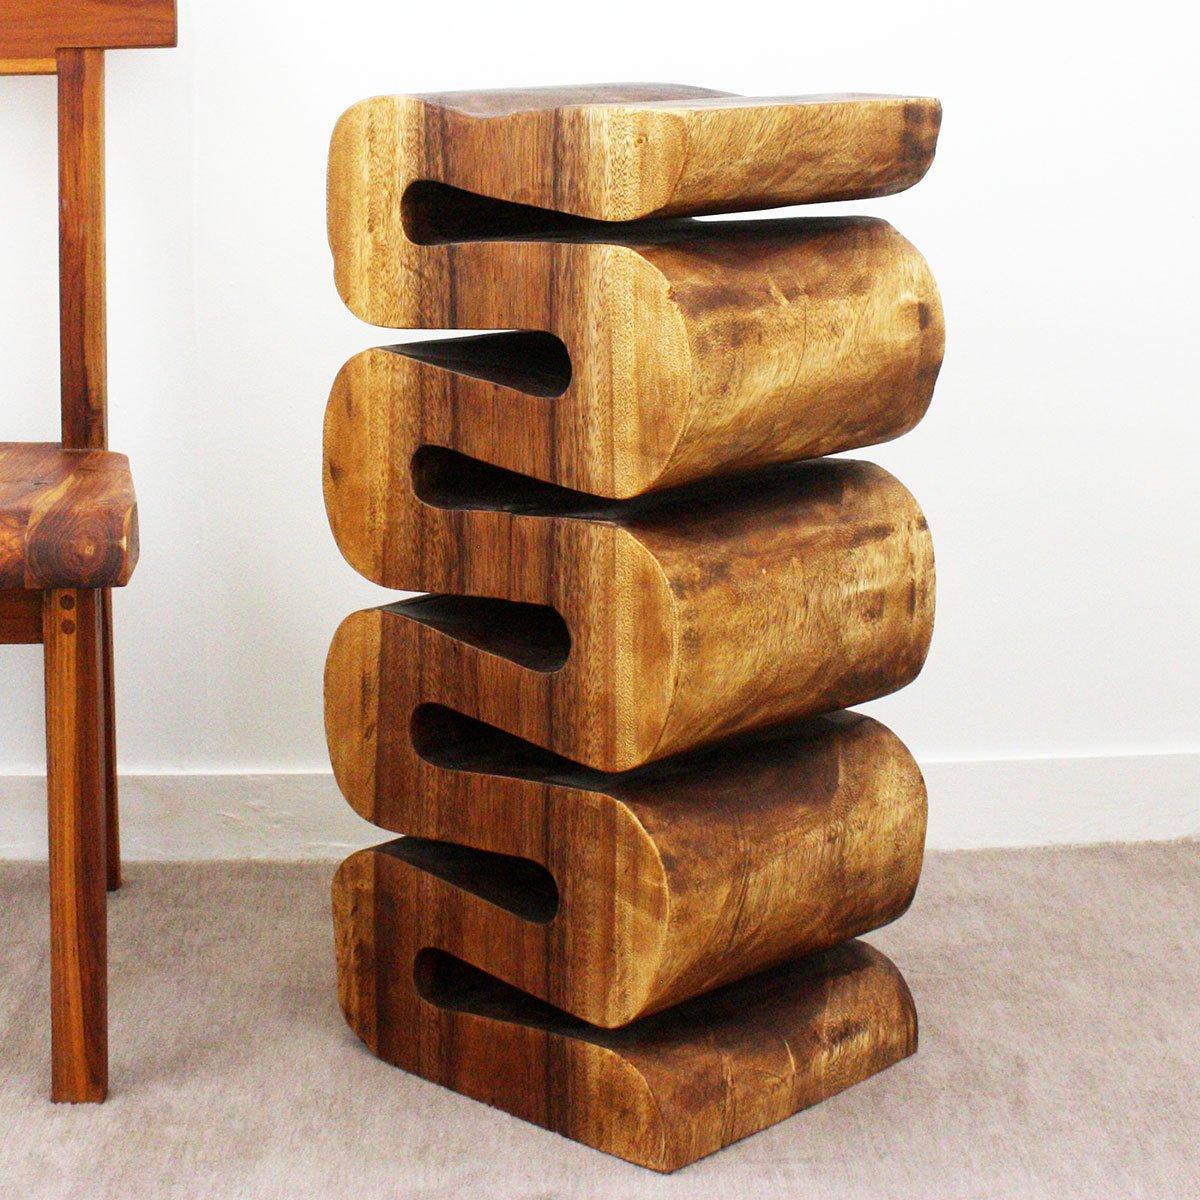 Wave Accordion Side Table 12x14x30 inch H Monkey Pod Wood w Livos Walnut Oil Fin